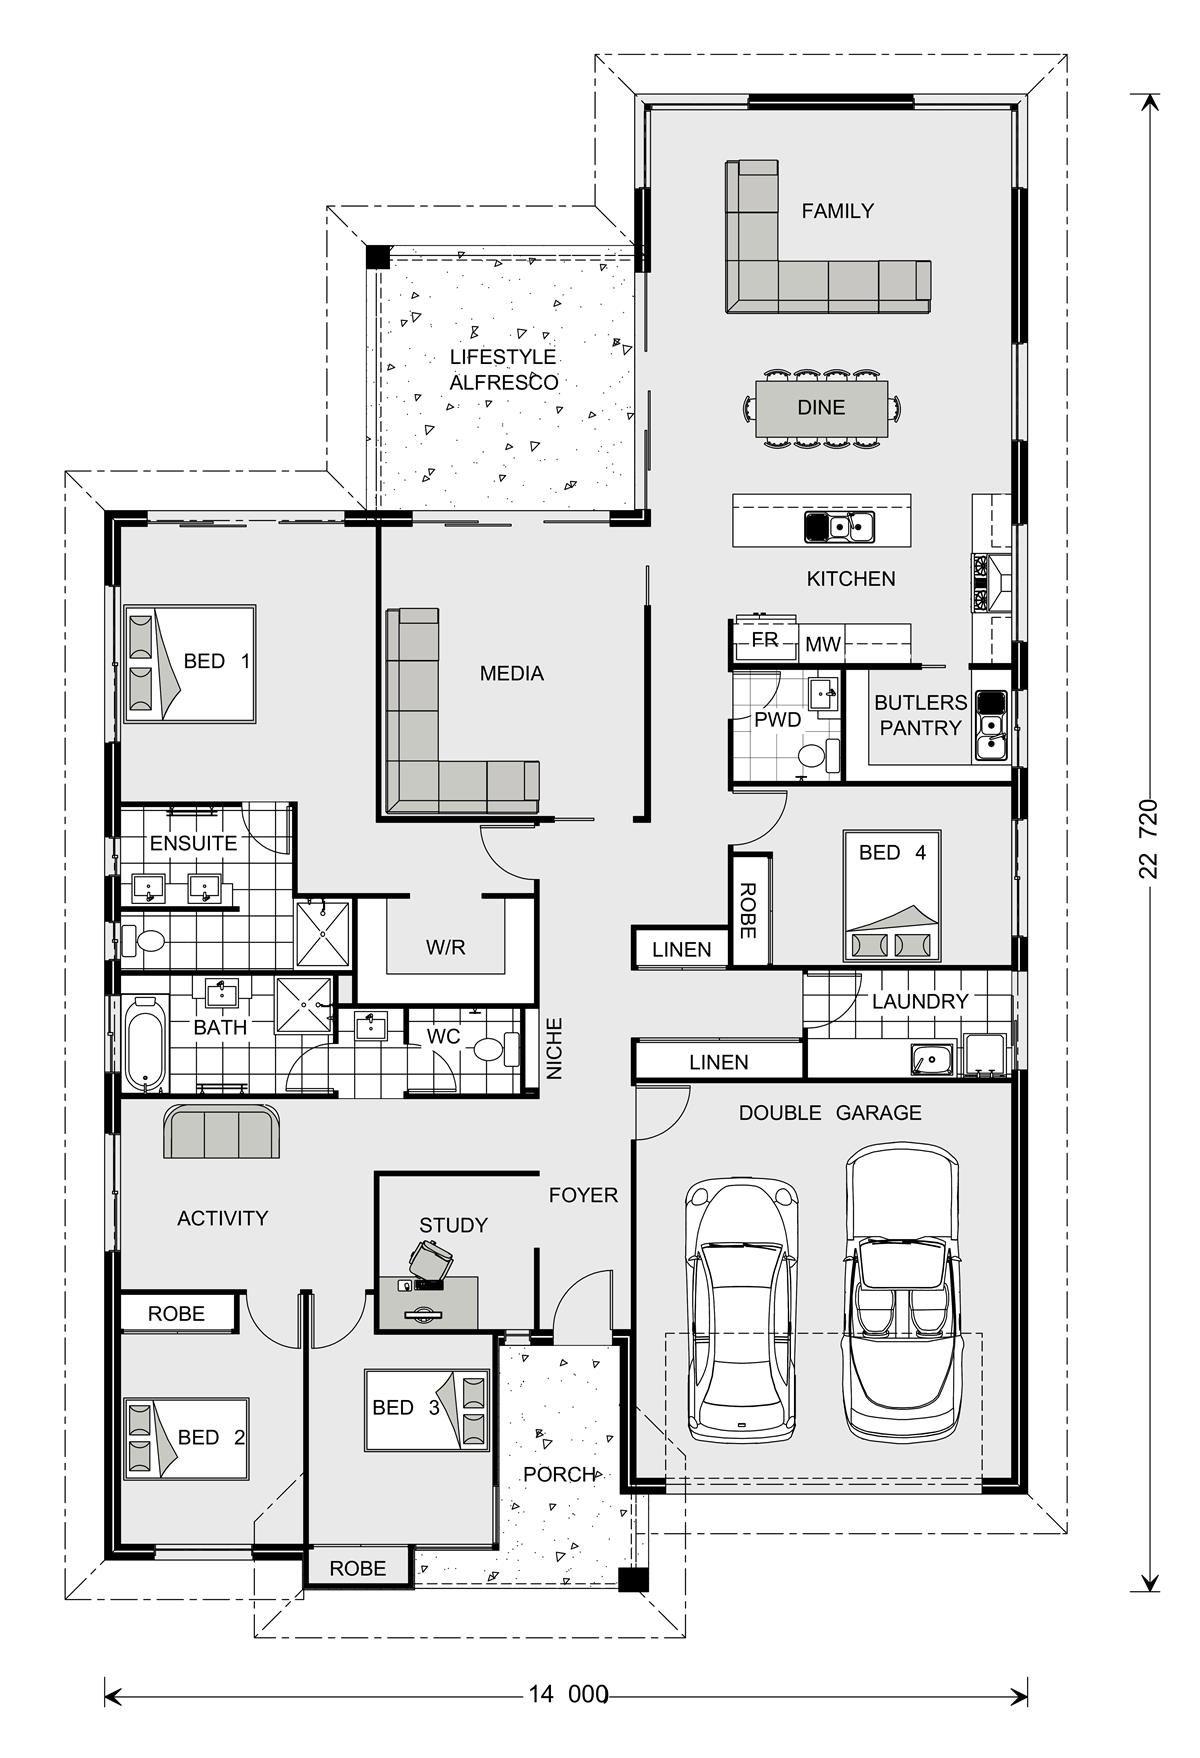 Pin By Jacqueline Peek On Plans House Plans Dream House Plans House Design